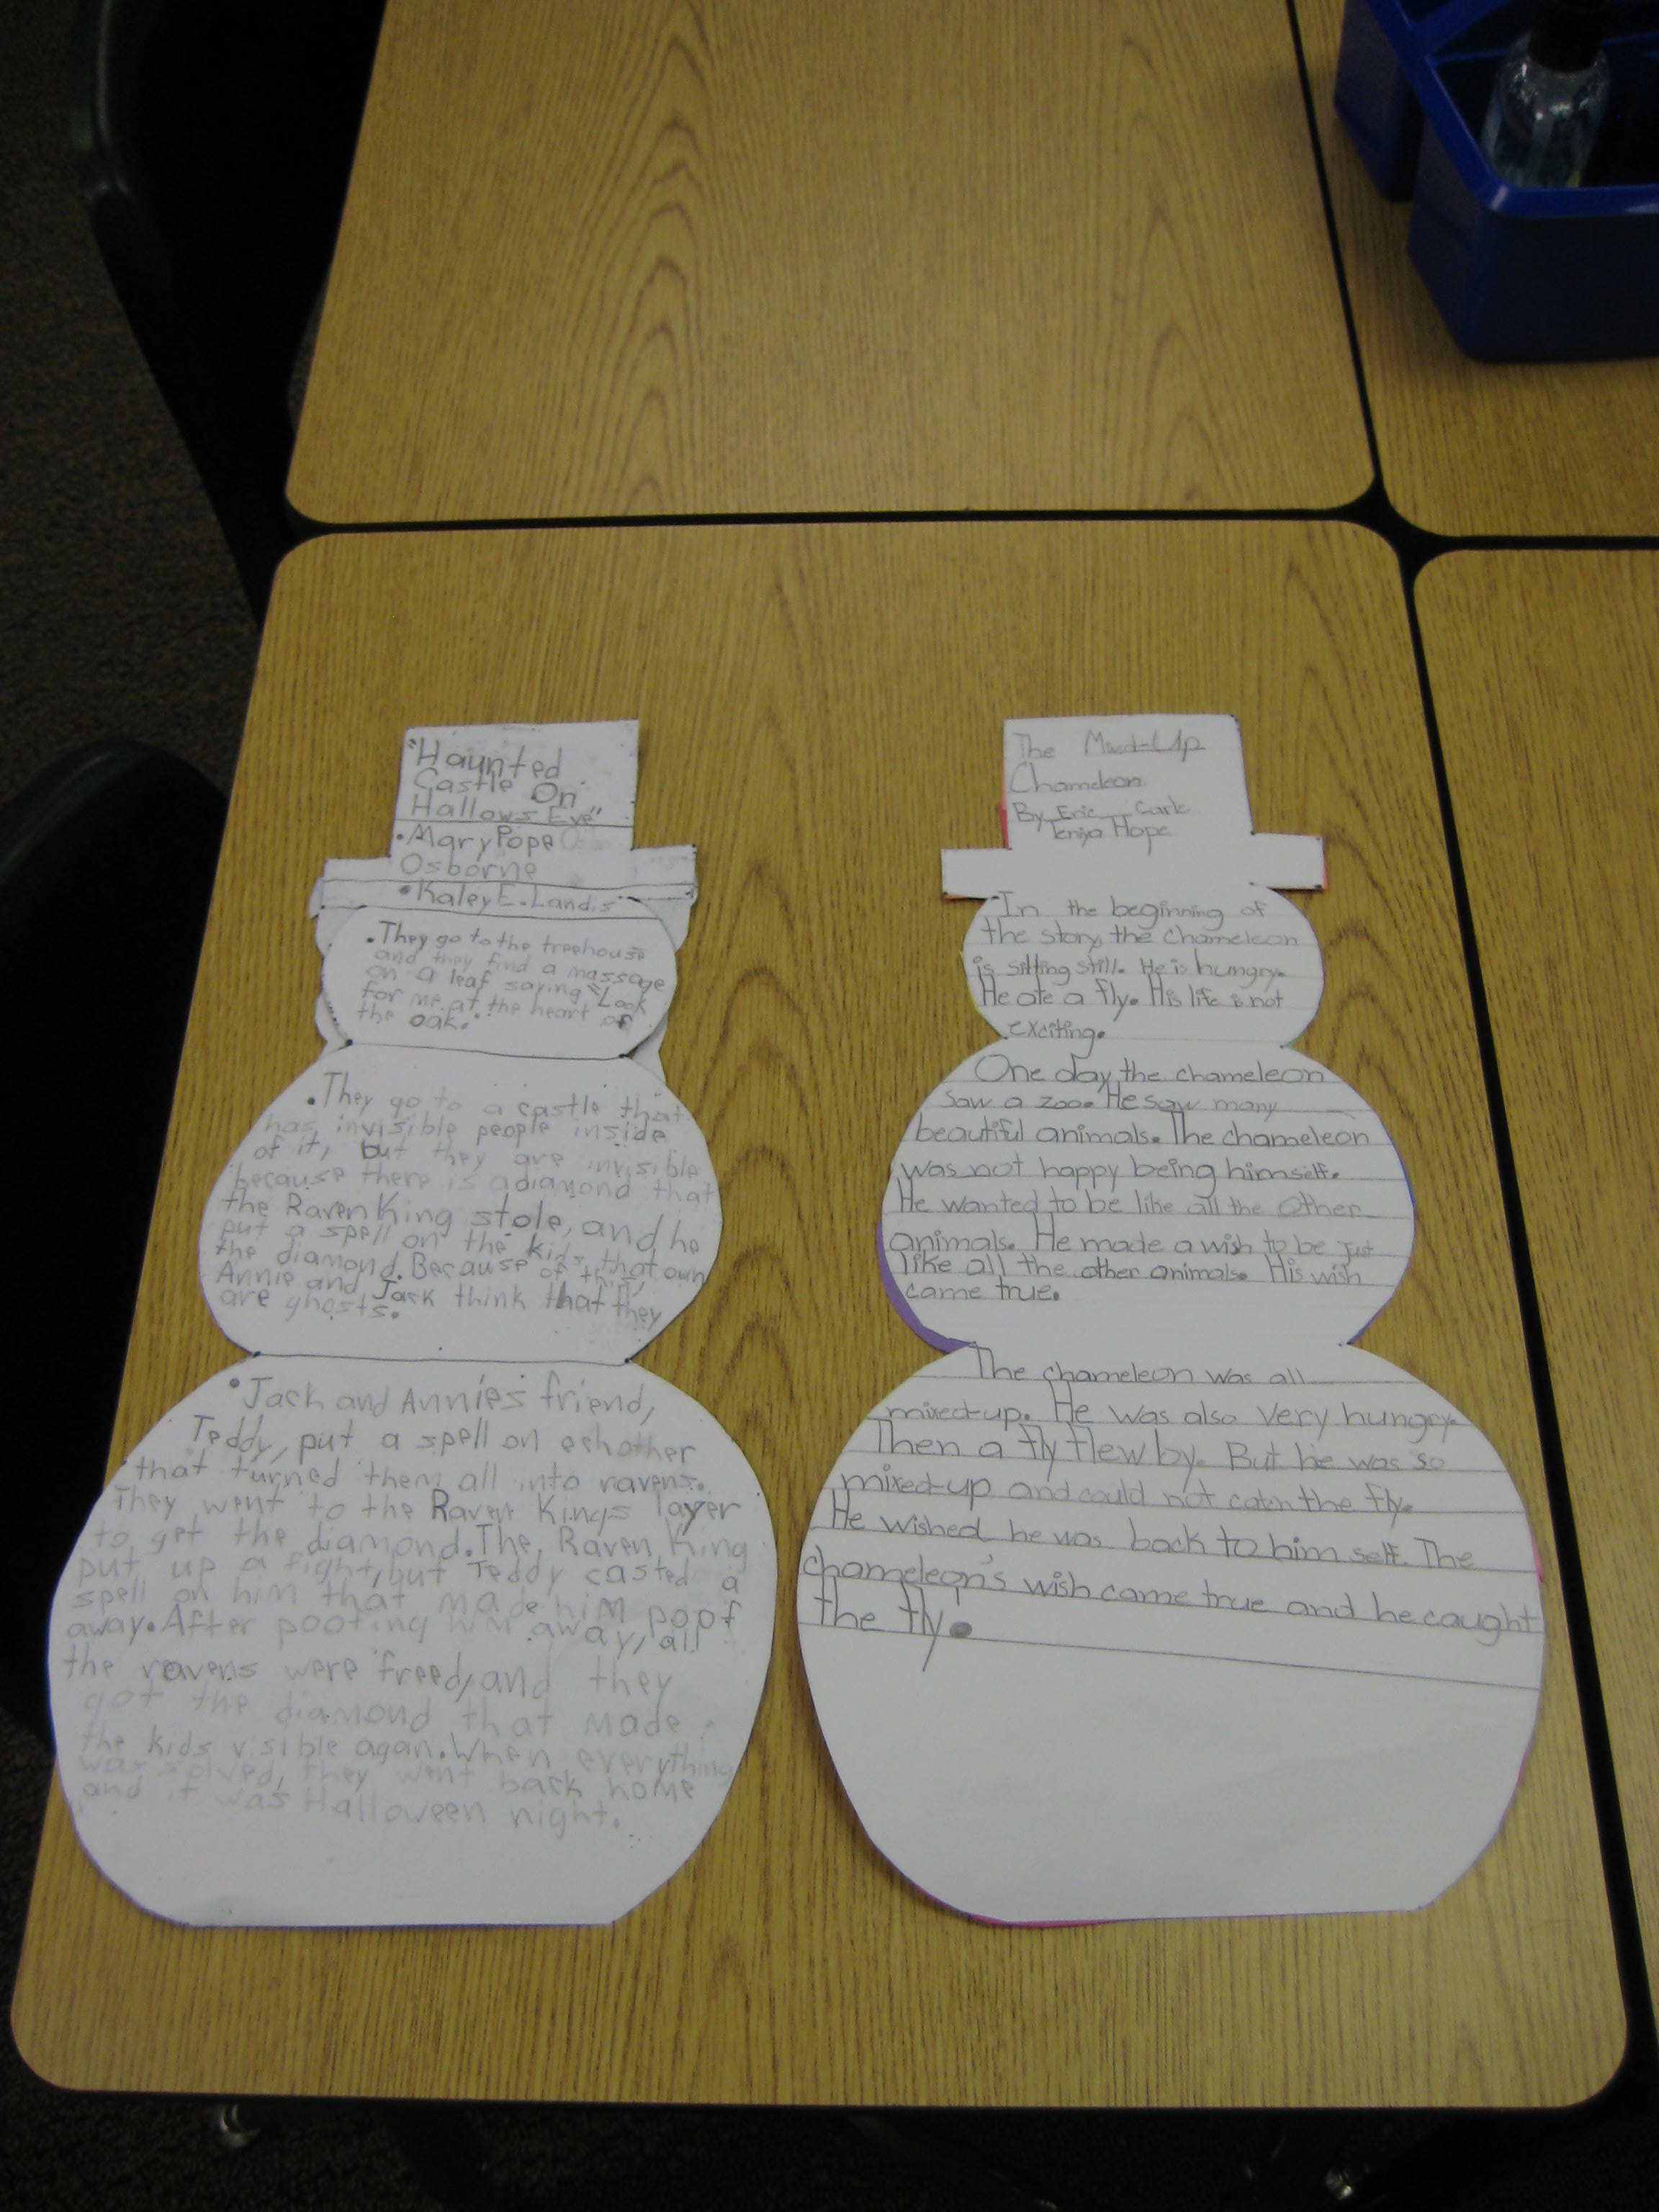 Snowman Book Report Due Thursday January 23rd